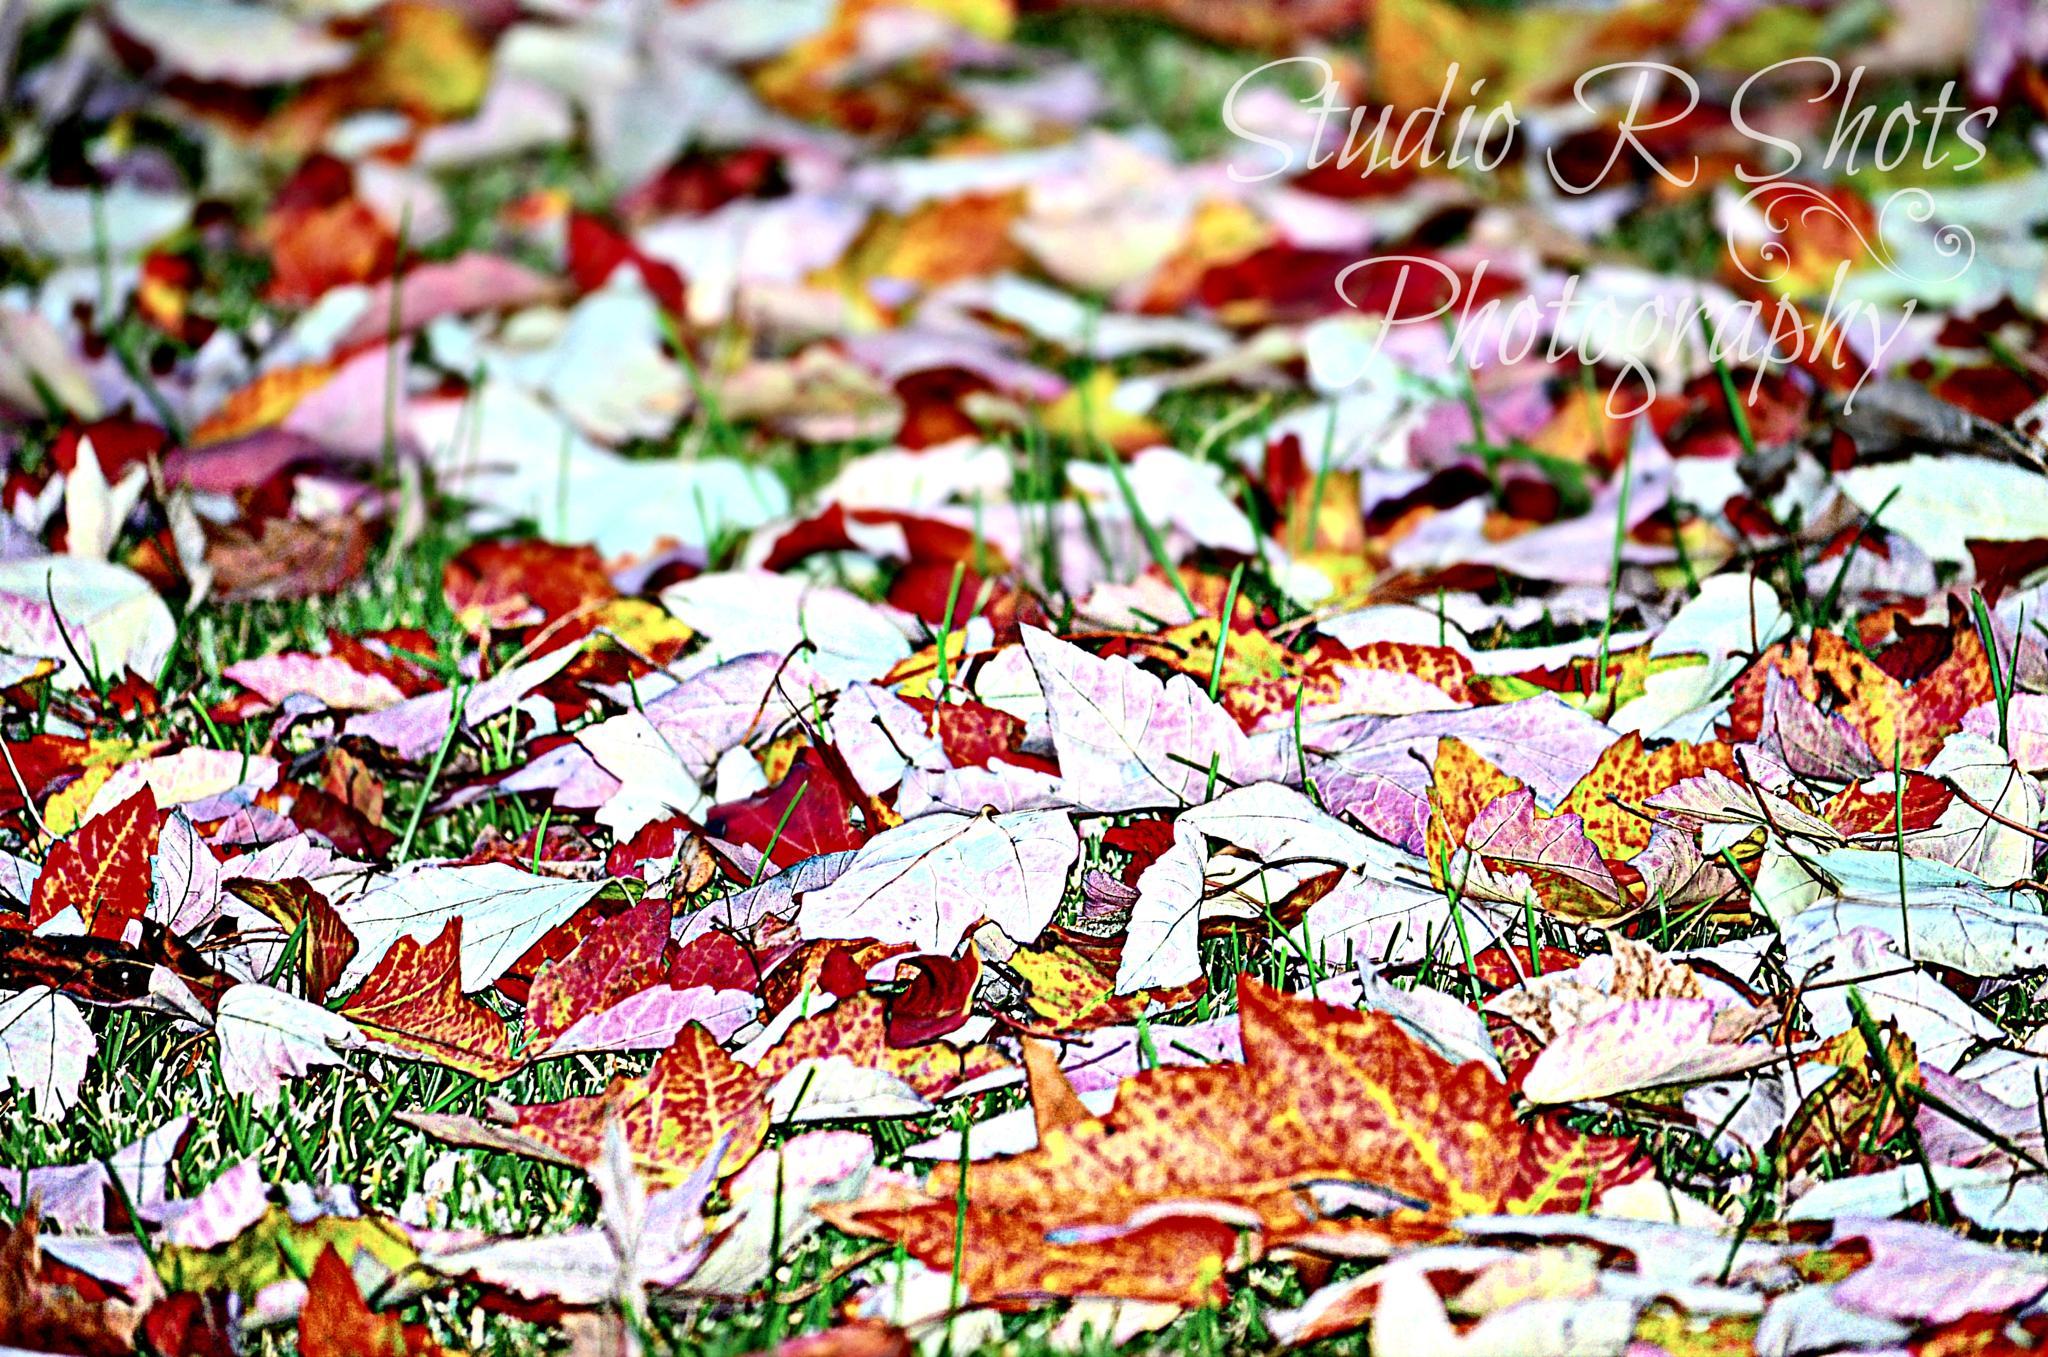 fallen leaves by Angie Peters Reszinski